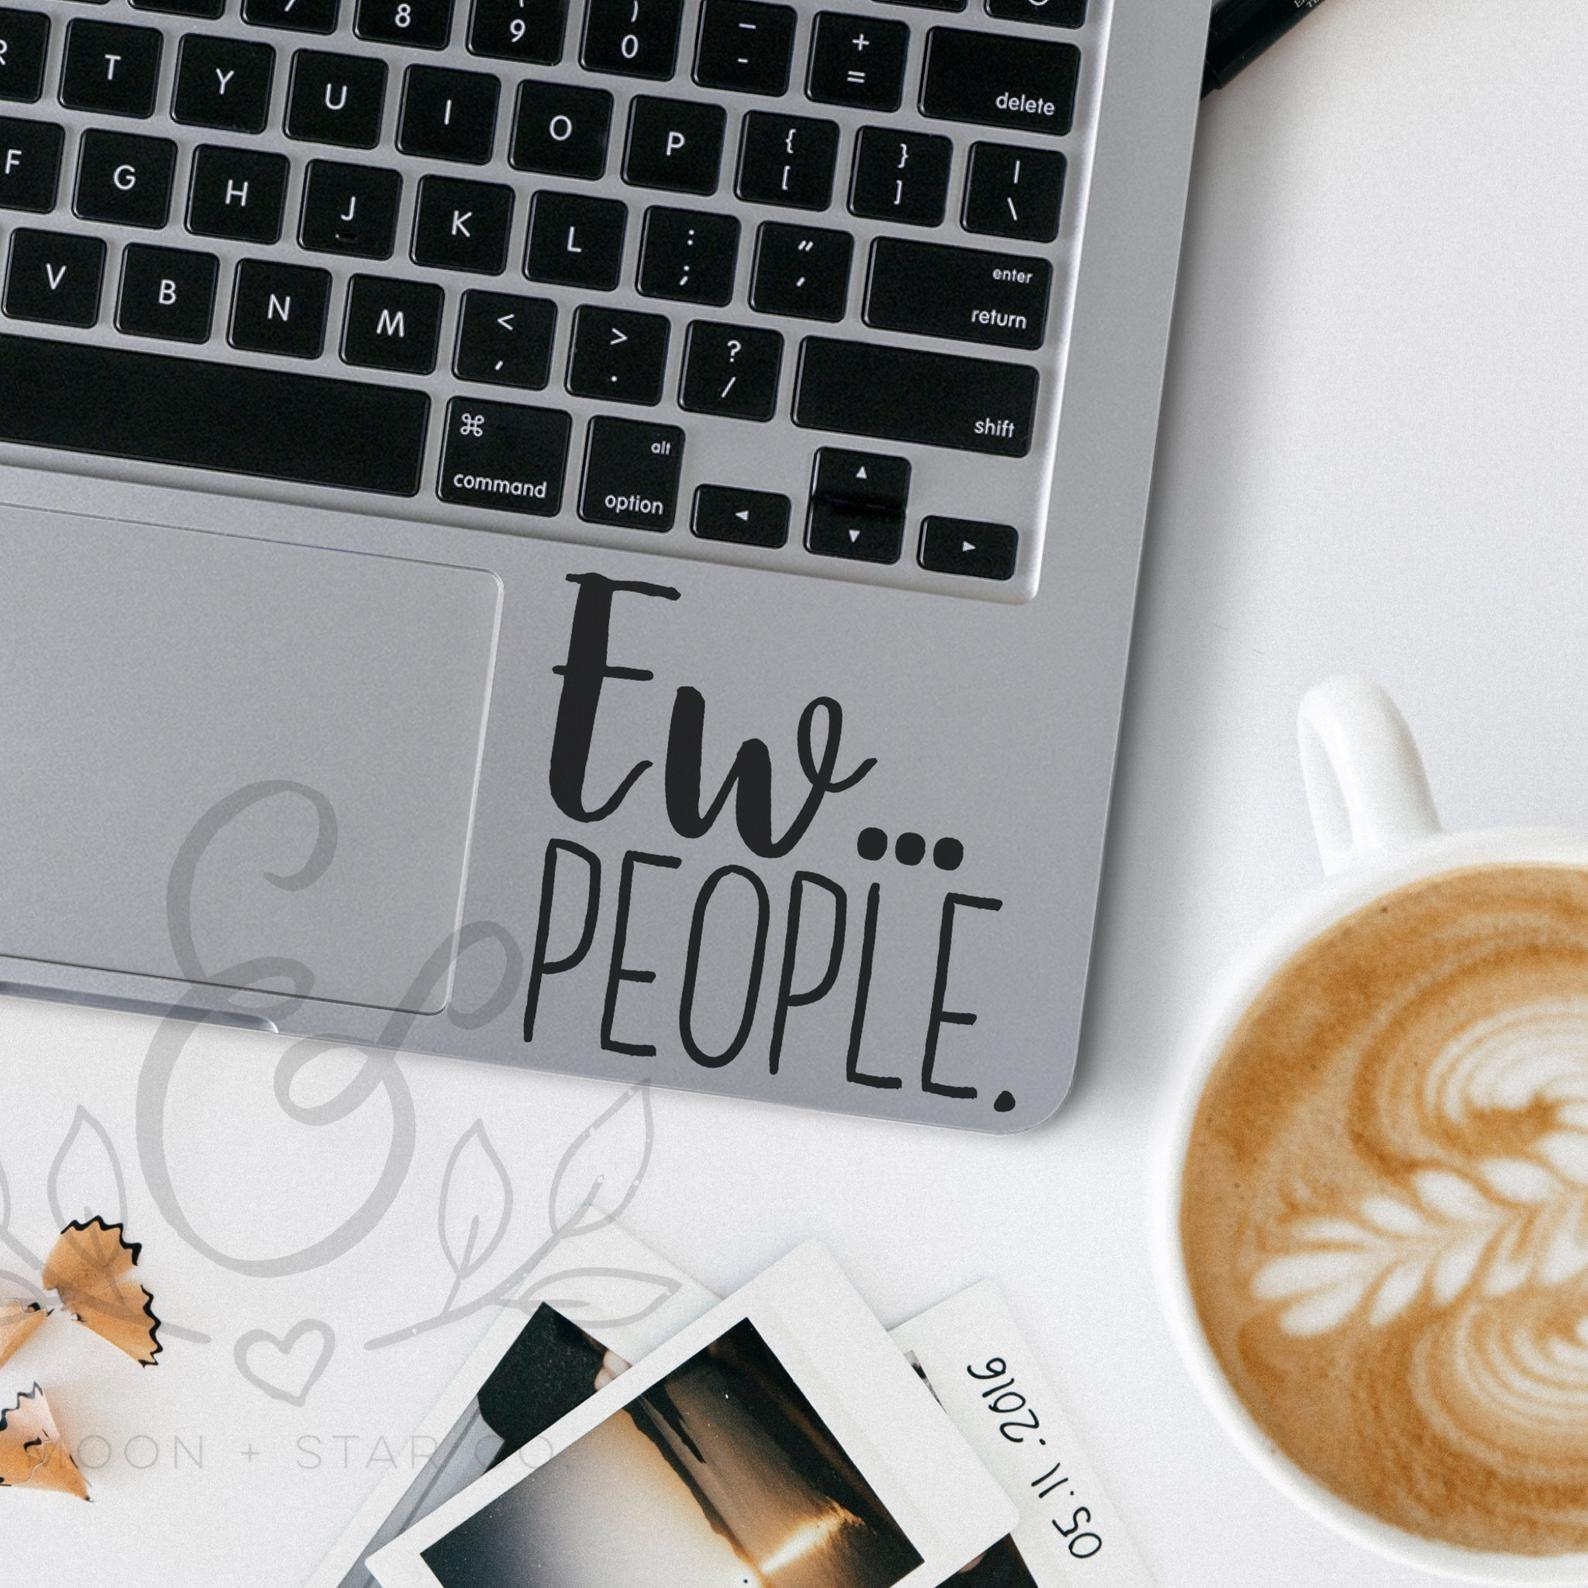 sticker on laptop that says ew people